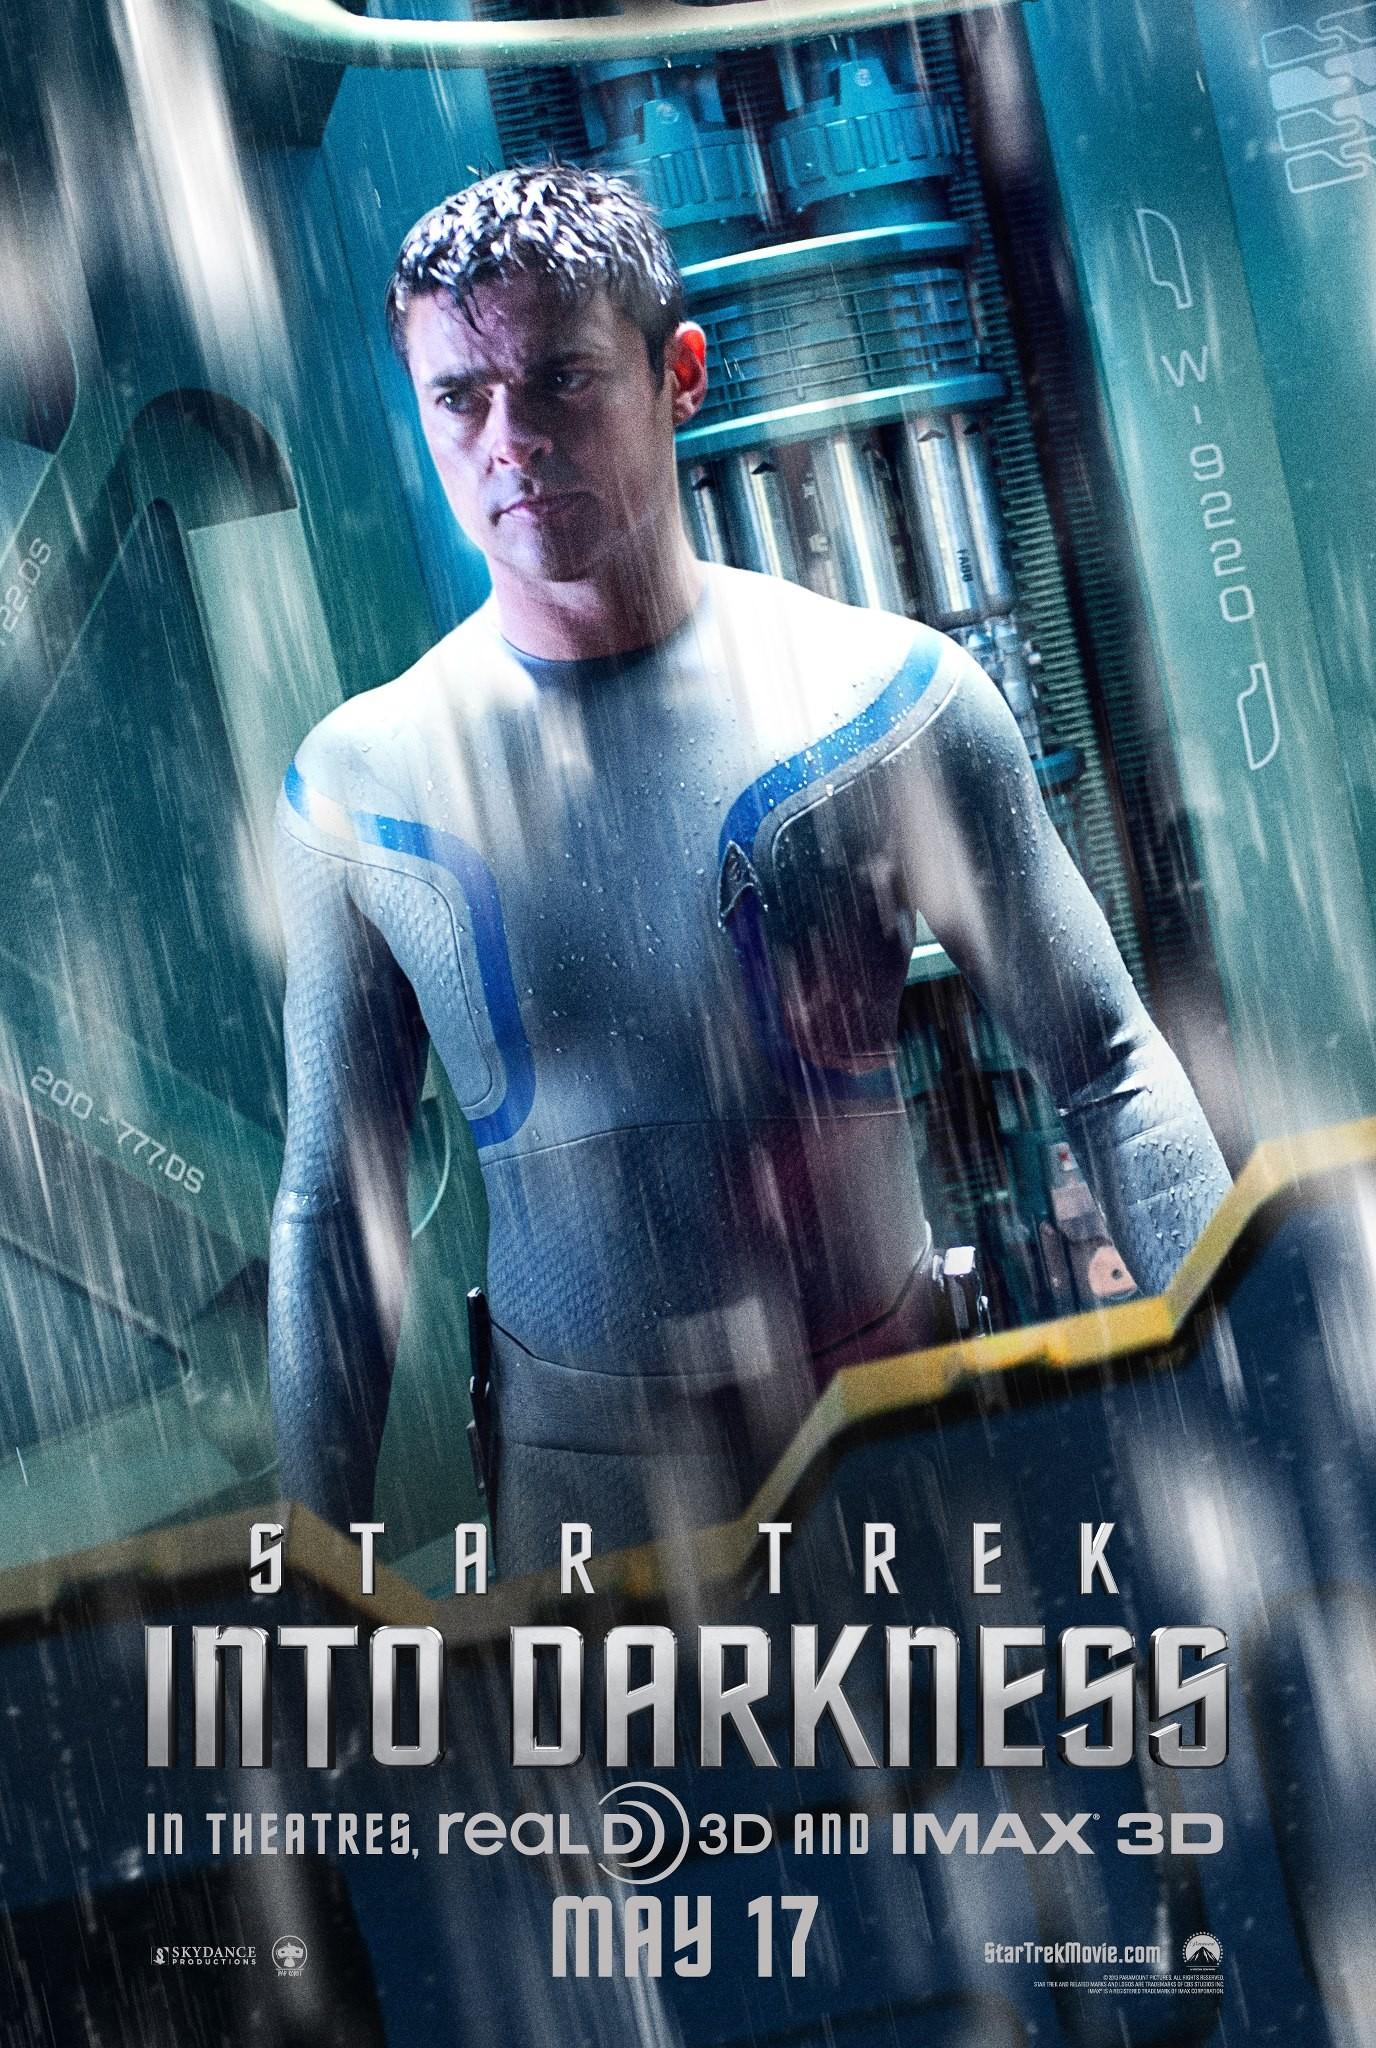 Star Trek Into Darkness new poster - 965.0KB